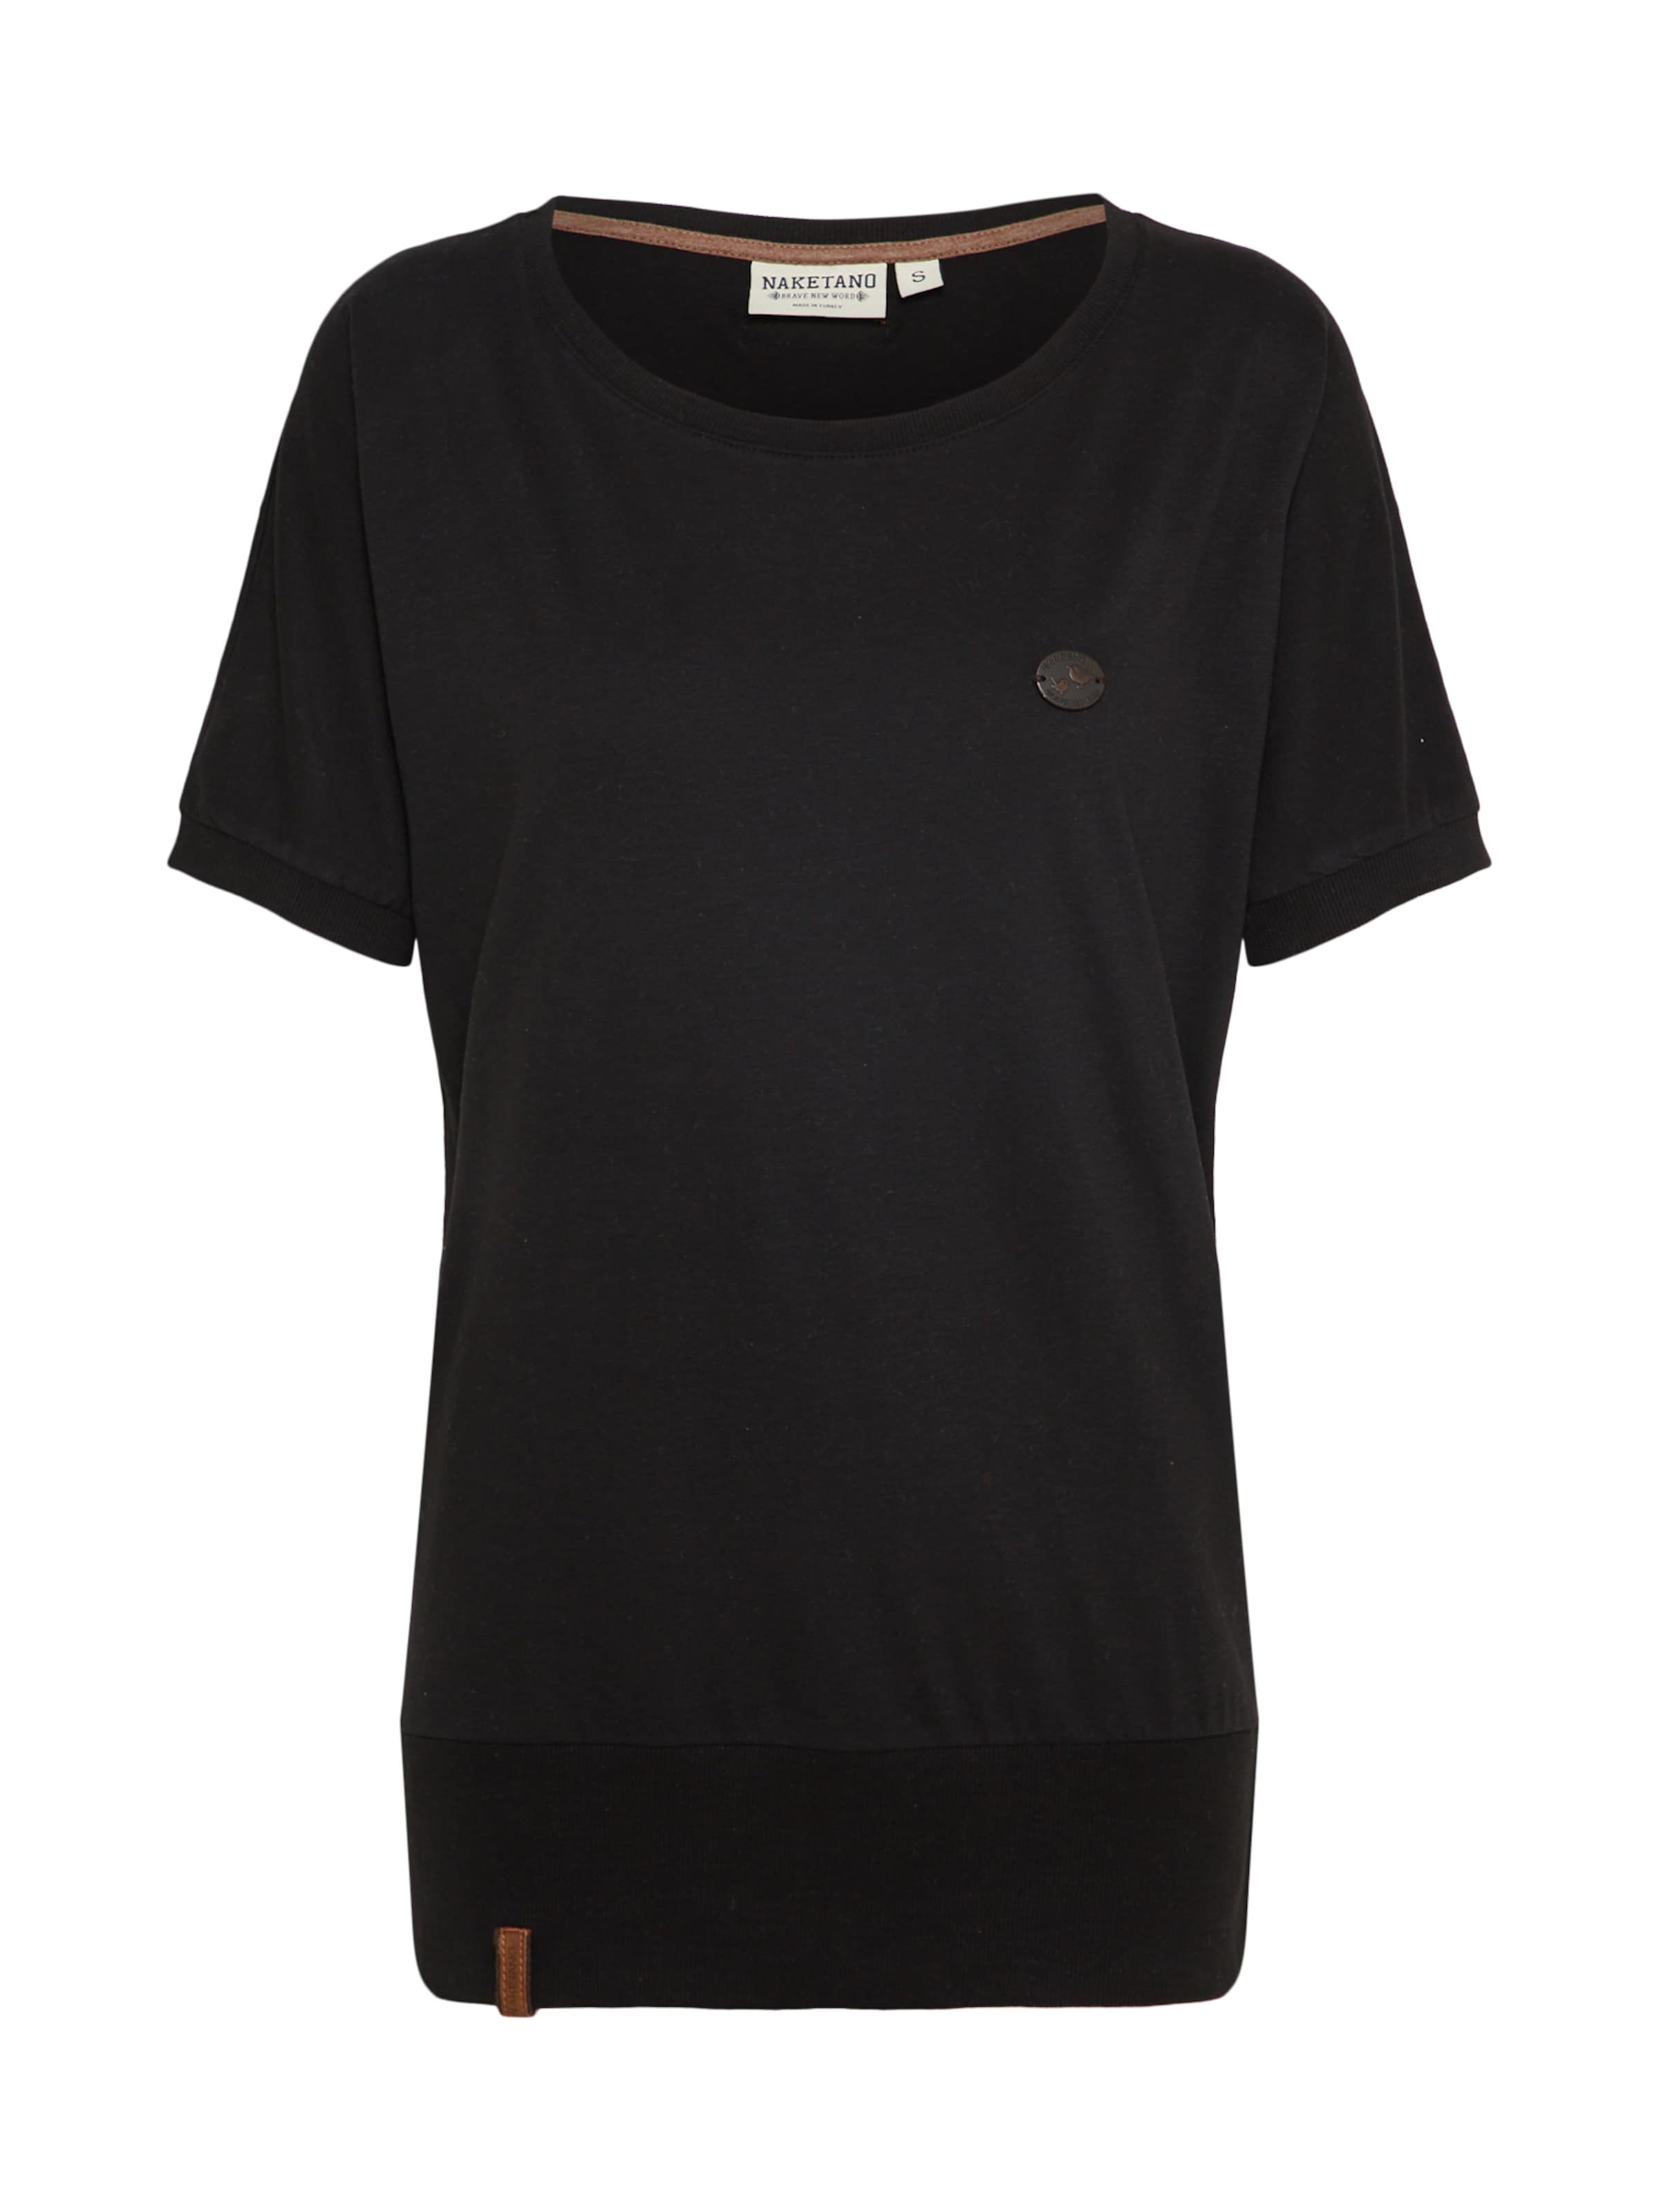 Naketano Noir It' 'baunxxx T En shirt Wit XZiuwOkTlP